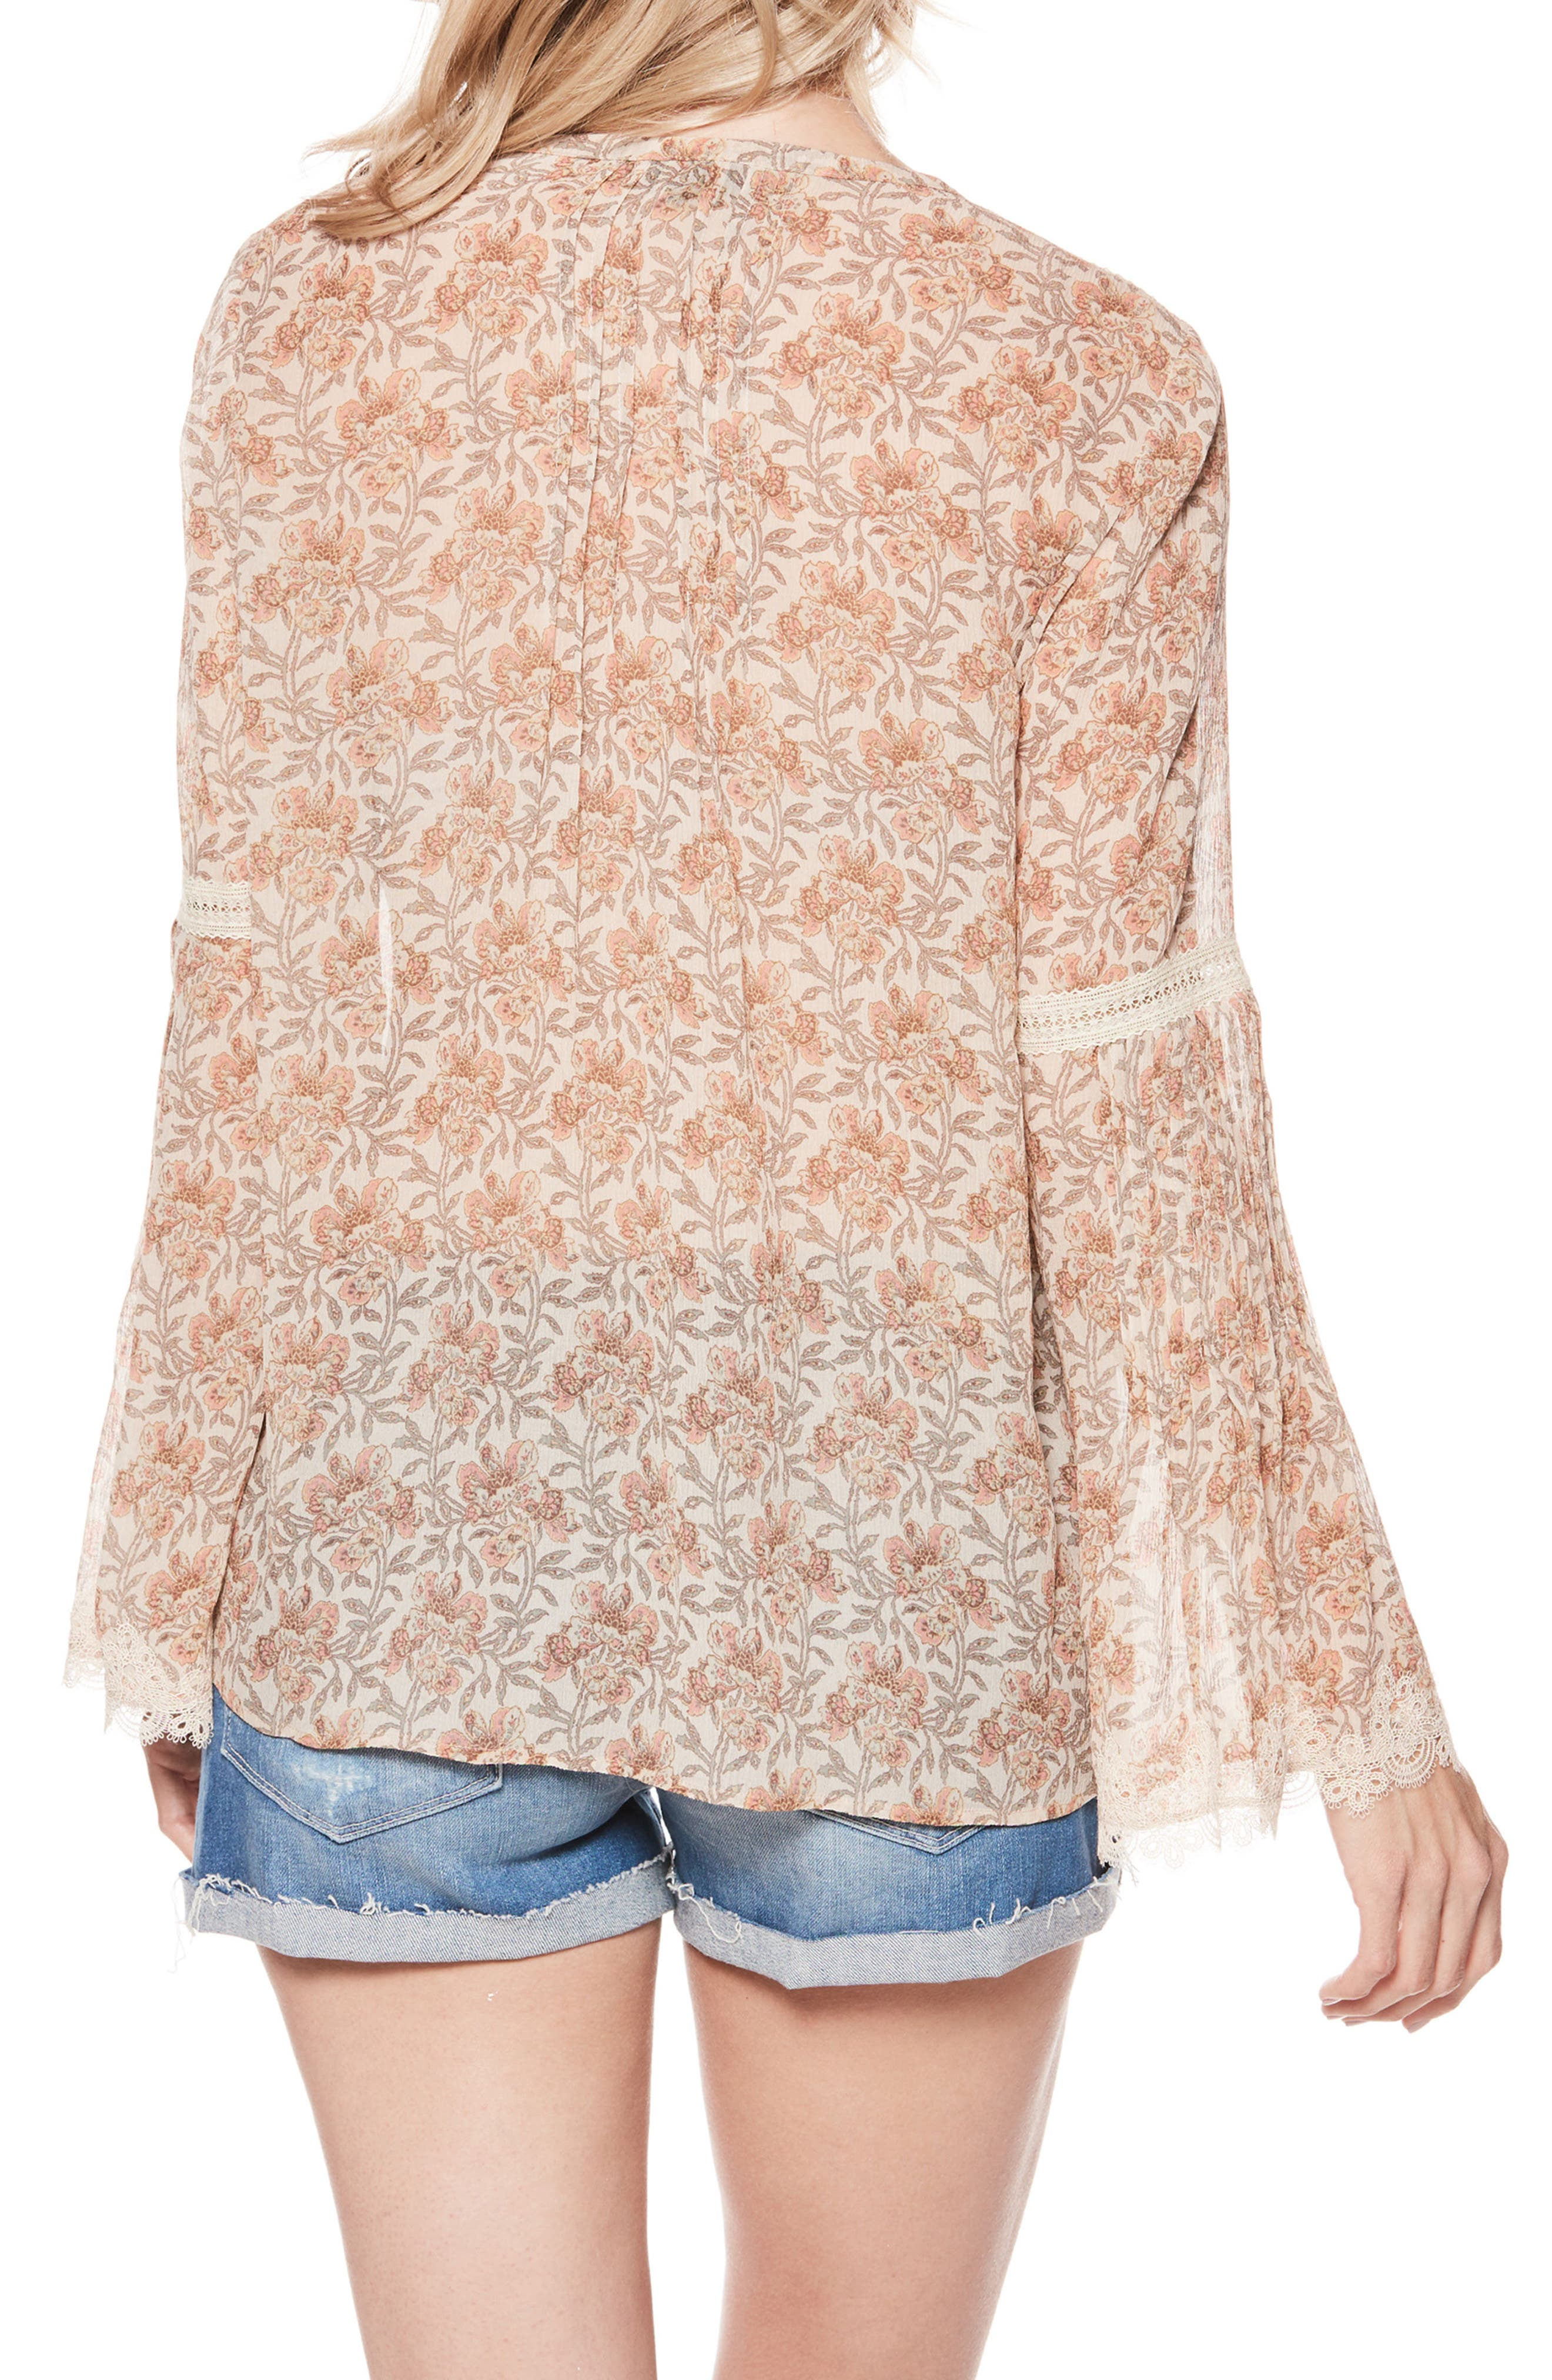 Clio Silk Blouse,                             Alternate thumbnail 3, color,                             Desert Sunrise Floral